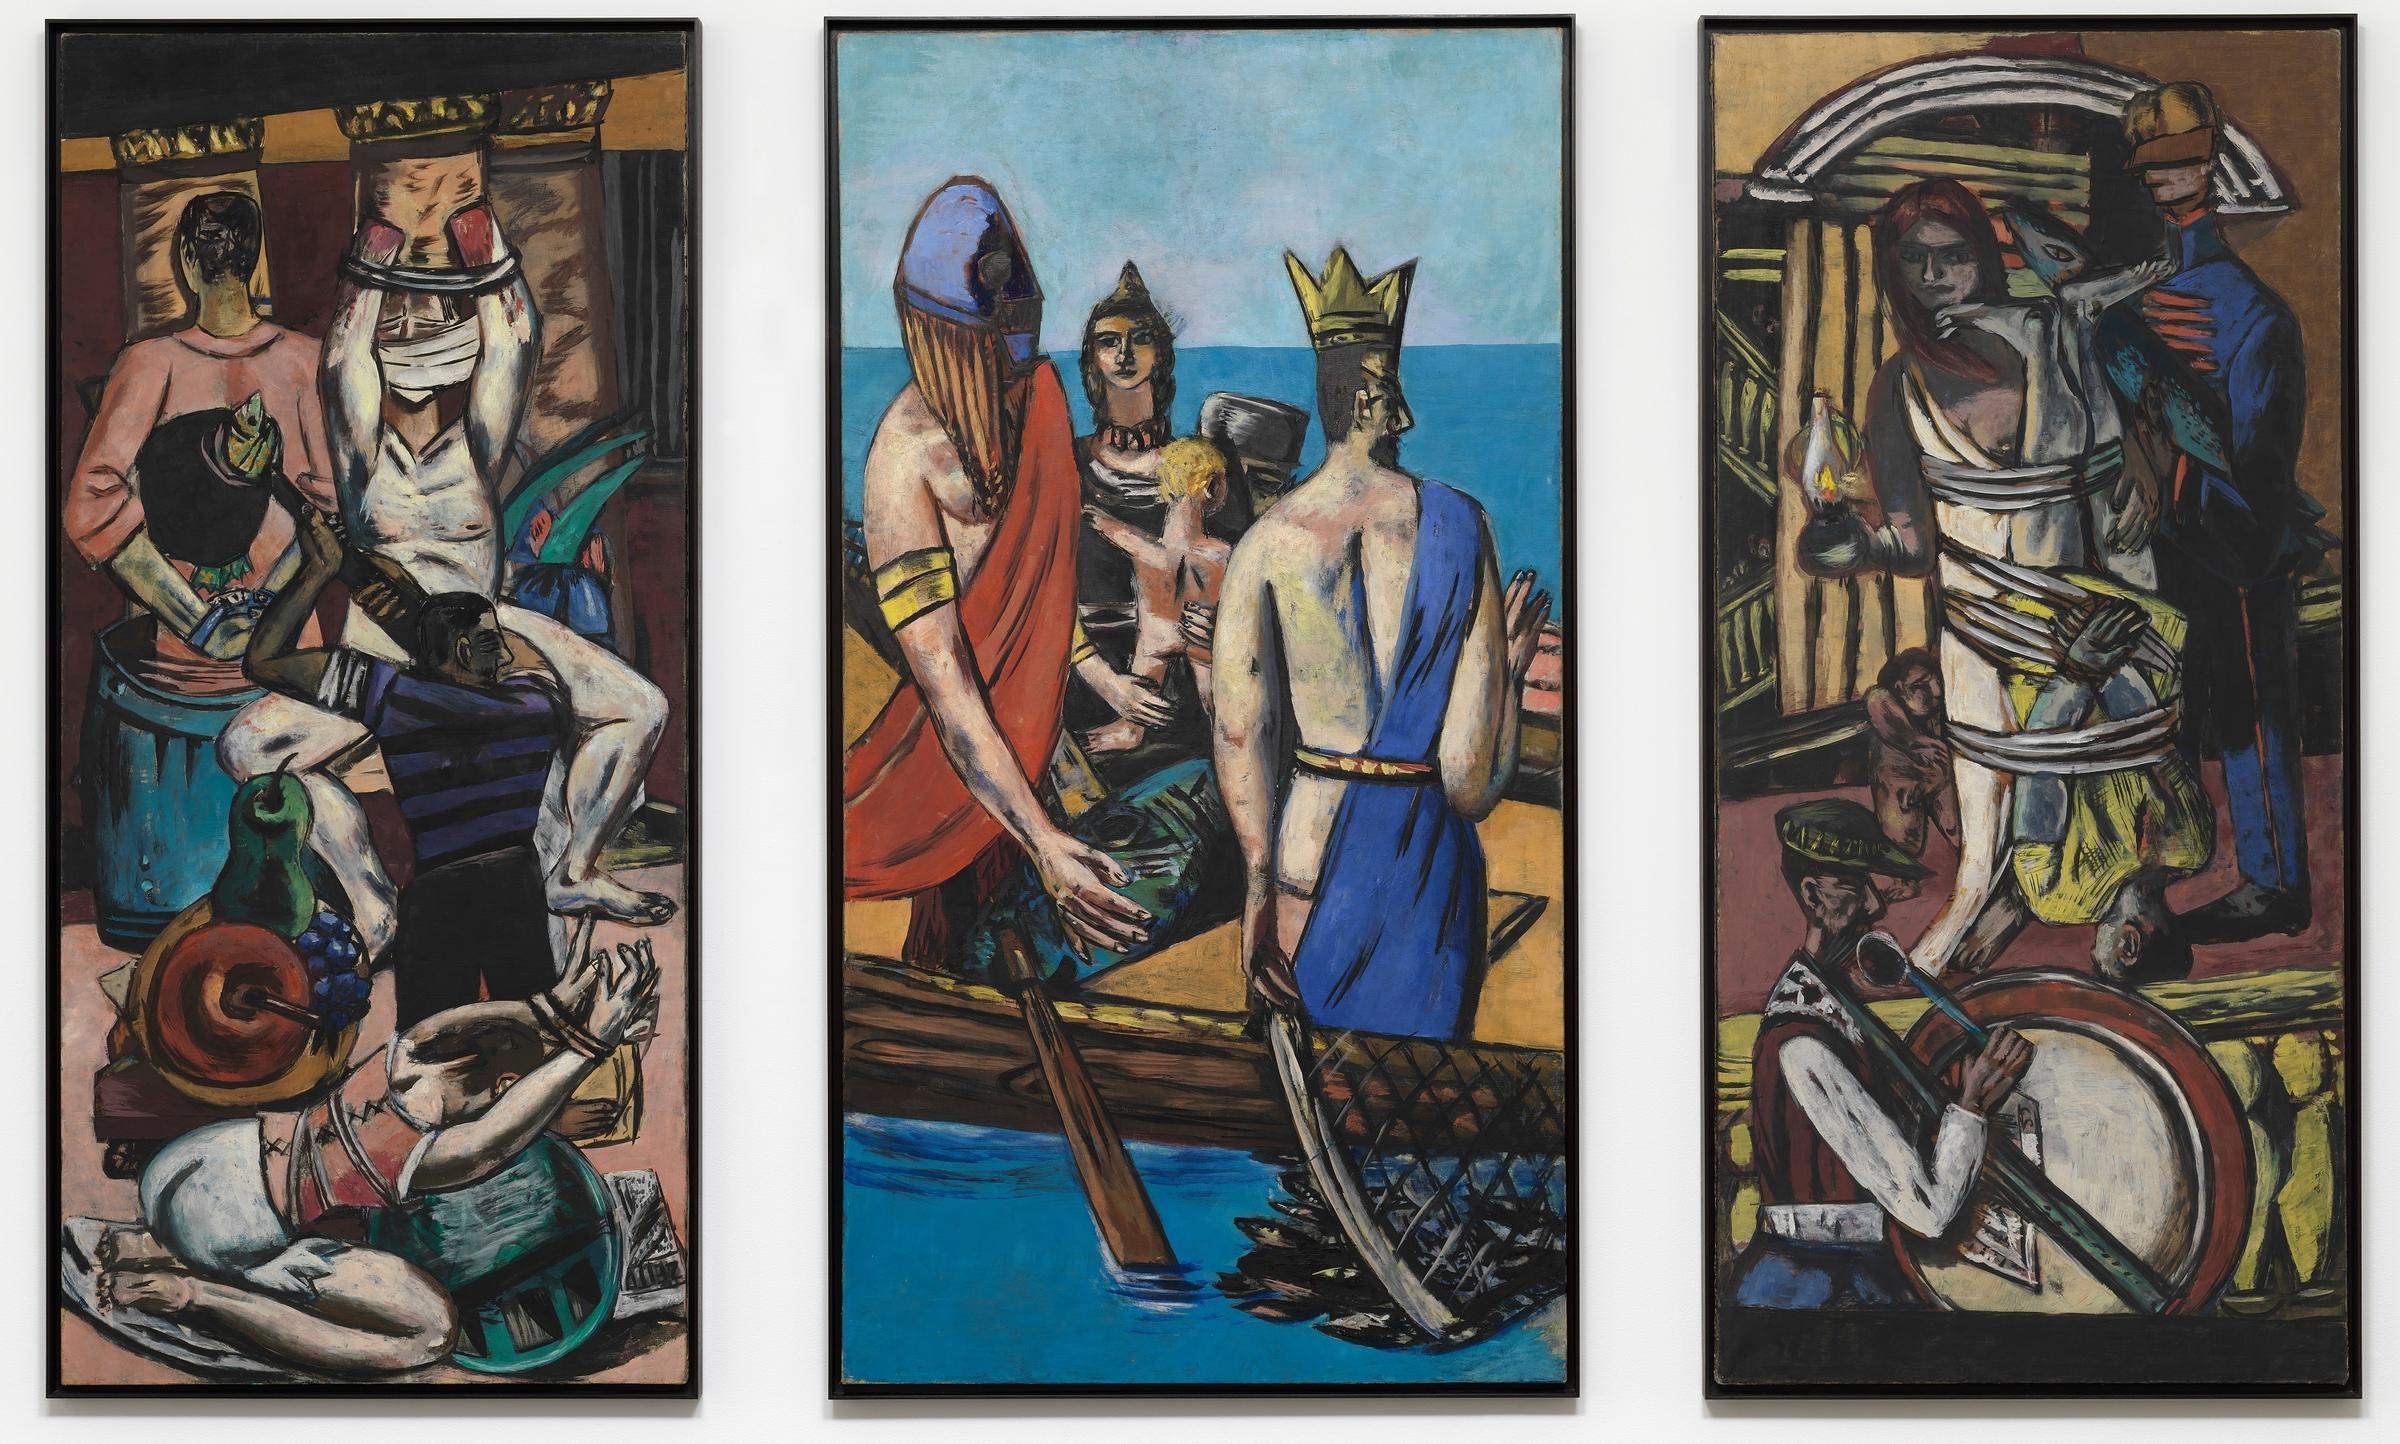 Departure (1932-1933), by Max Beckmann.